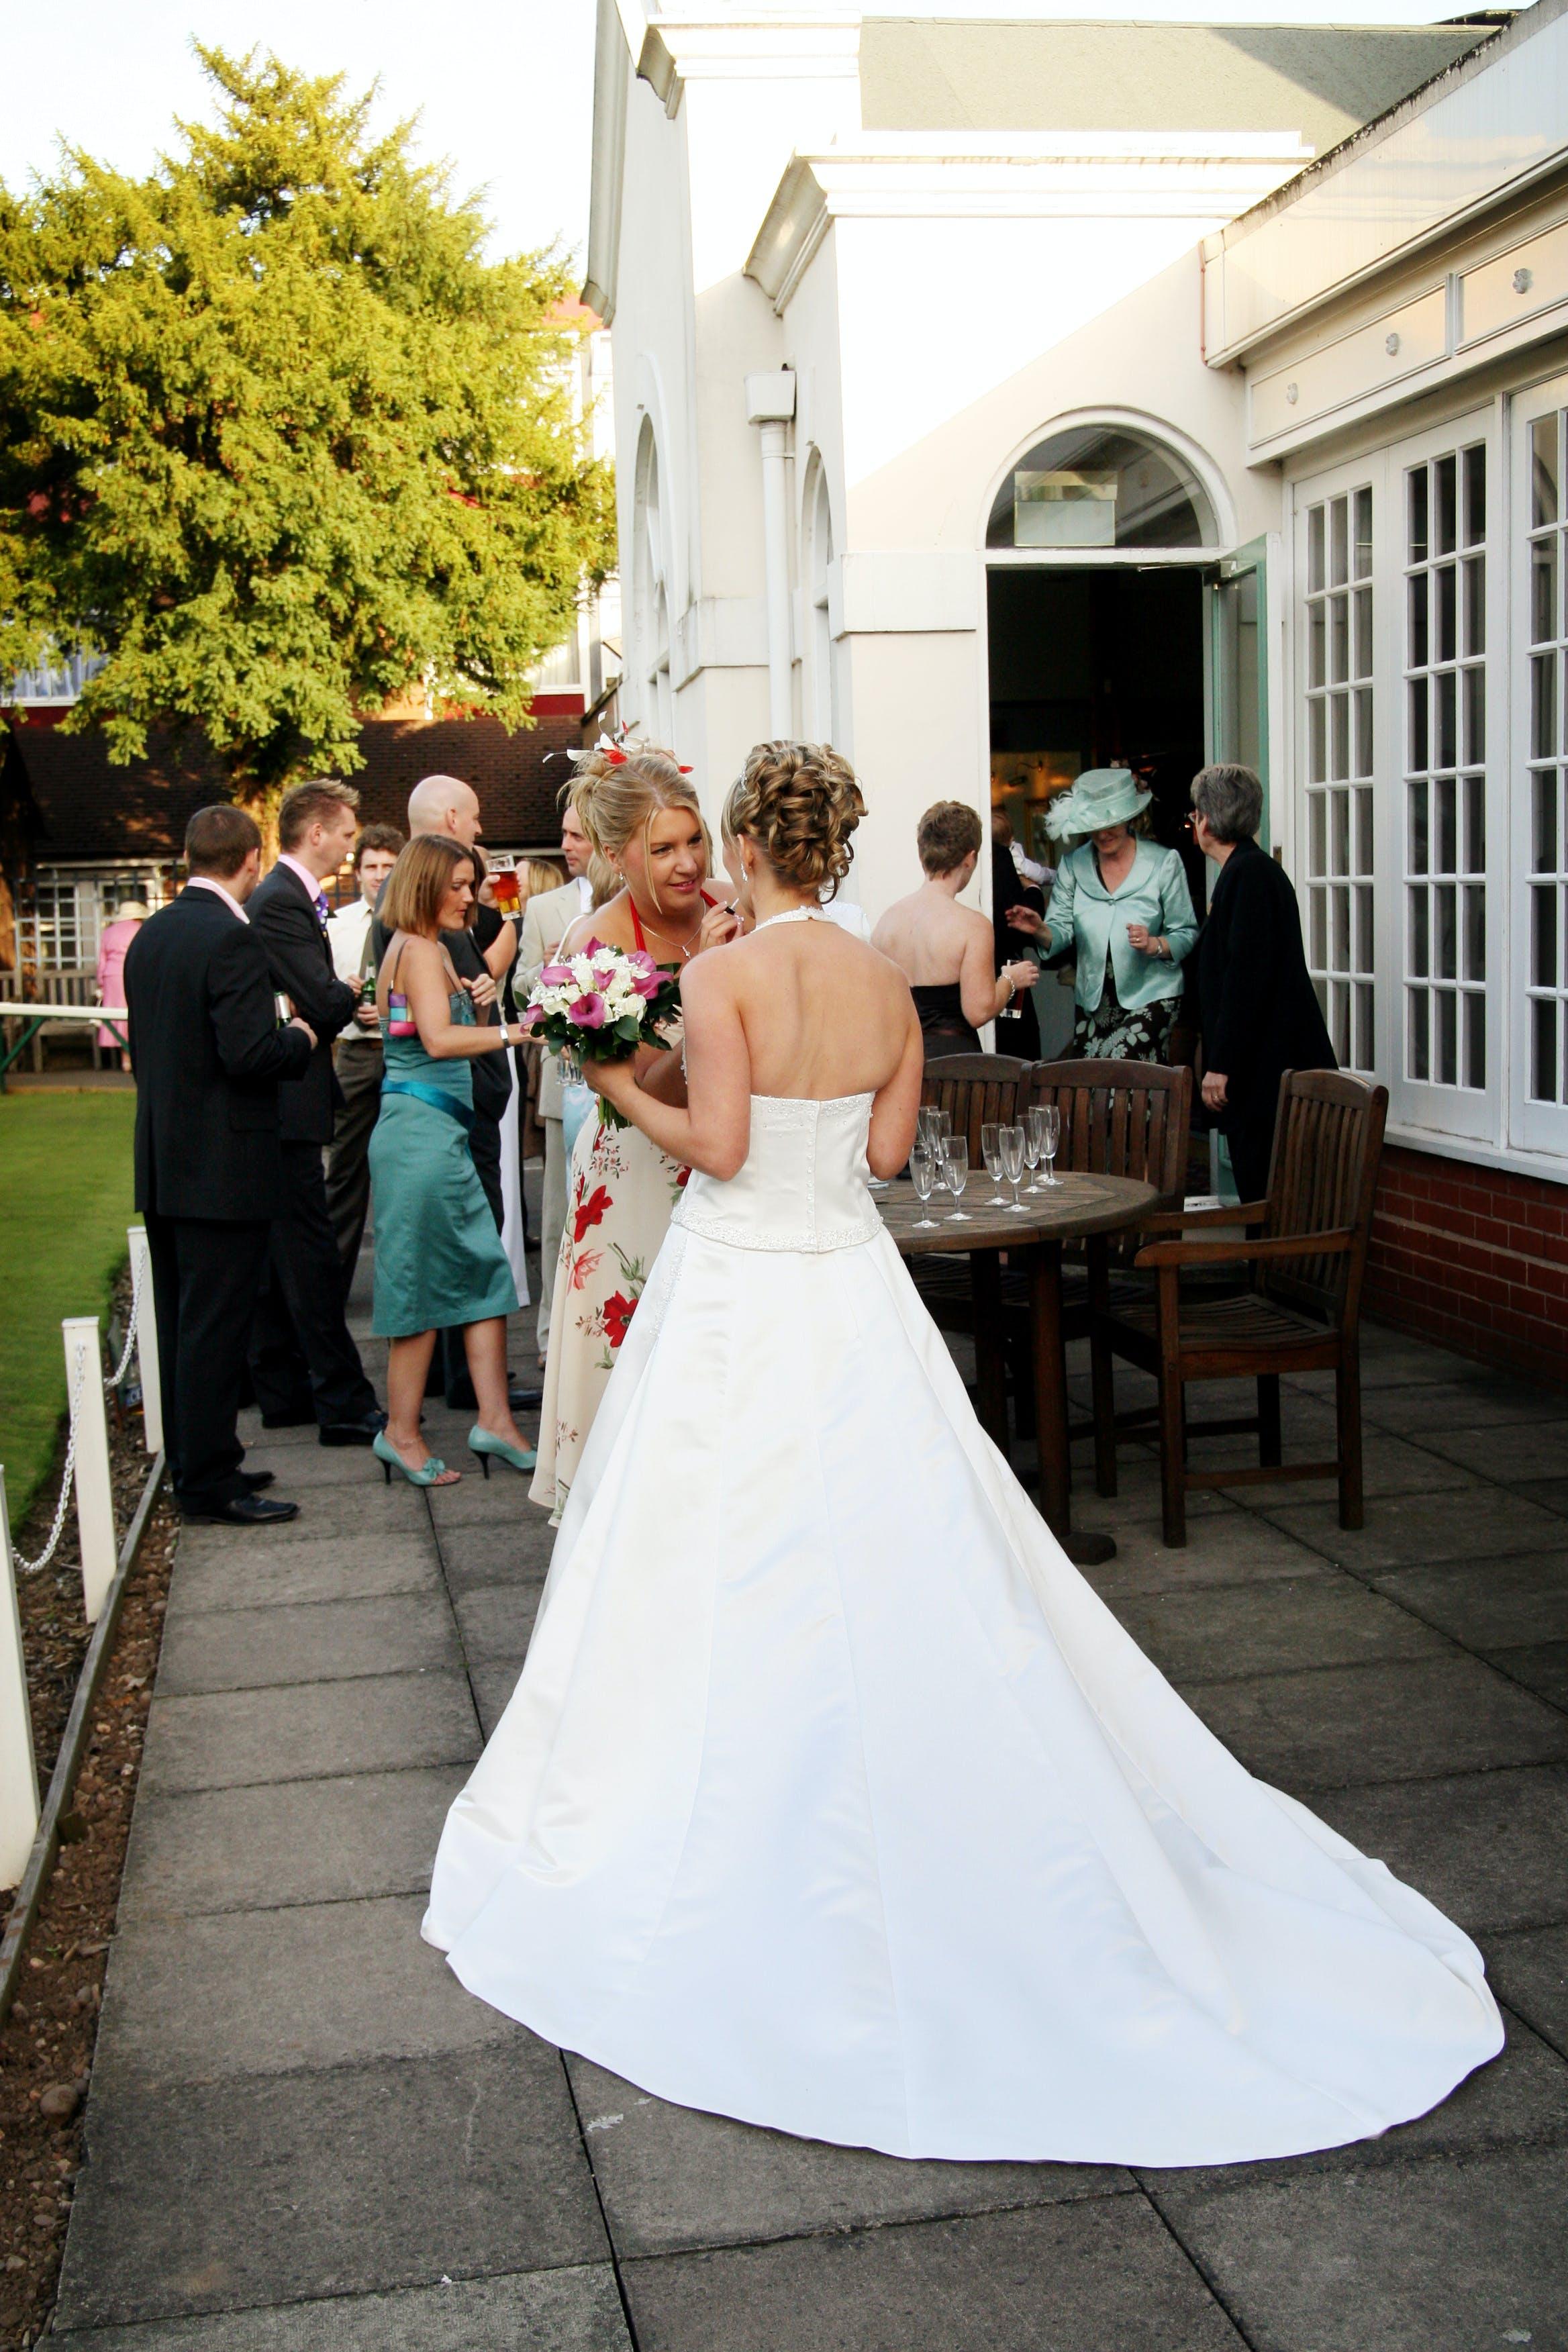 Wedding Venues In West Midlands Bridebook